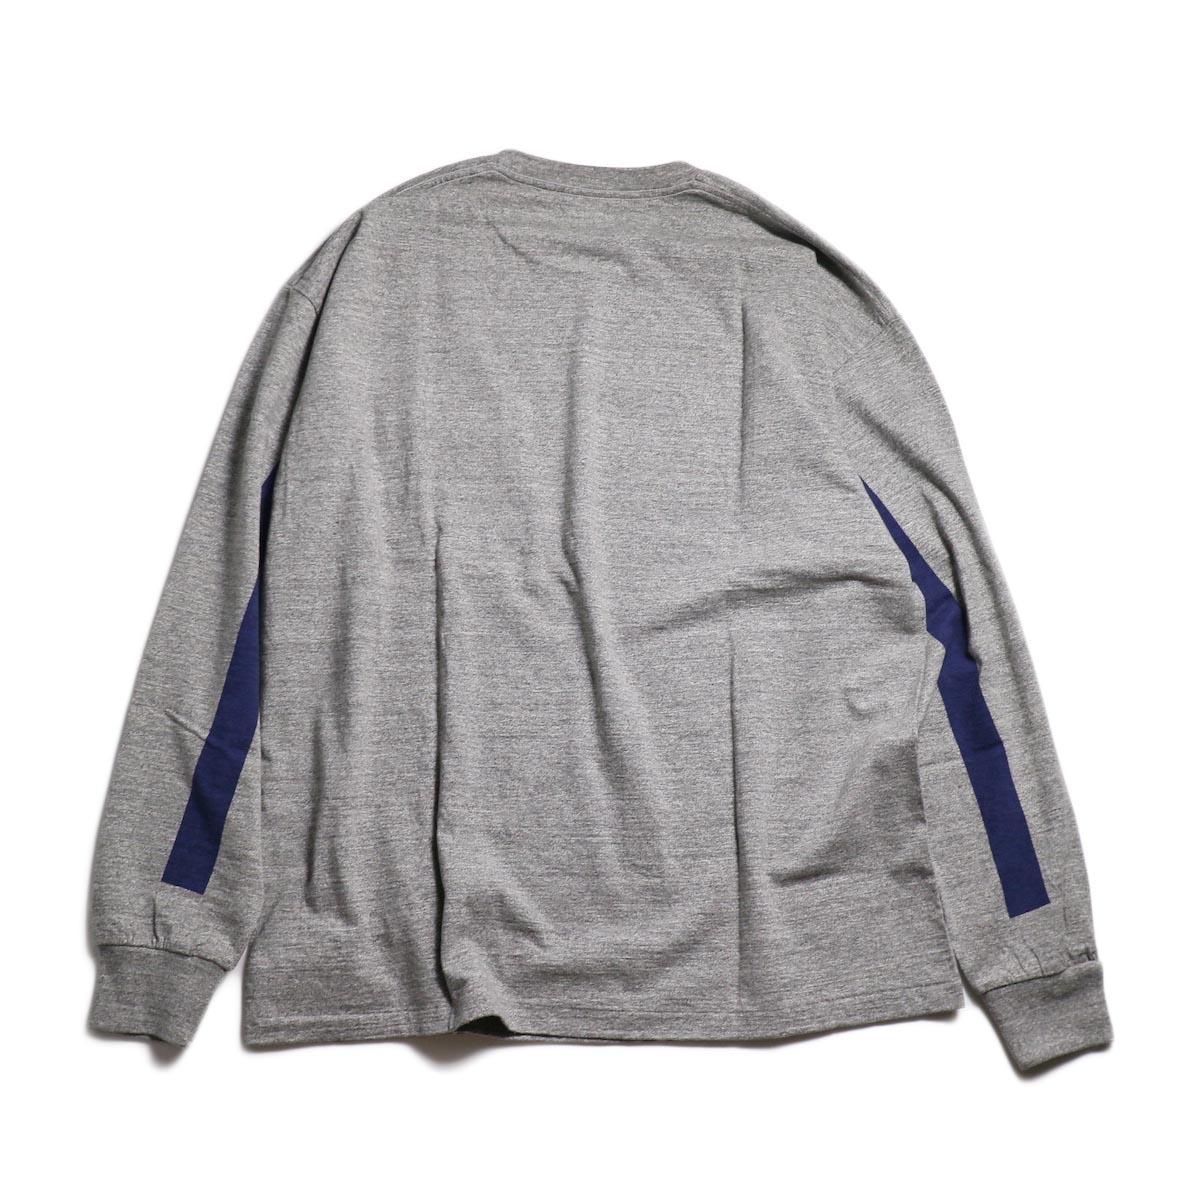 Kaptain Sunshine / West Coast L/S Tee -Feather Grey × Navy Line 背面